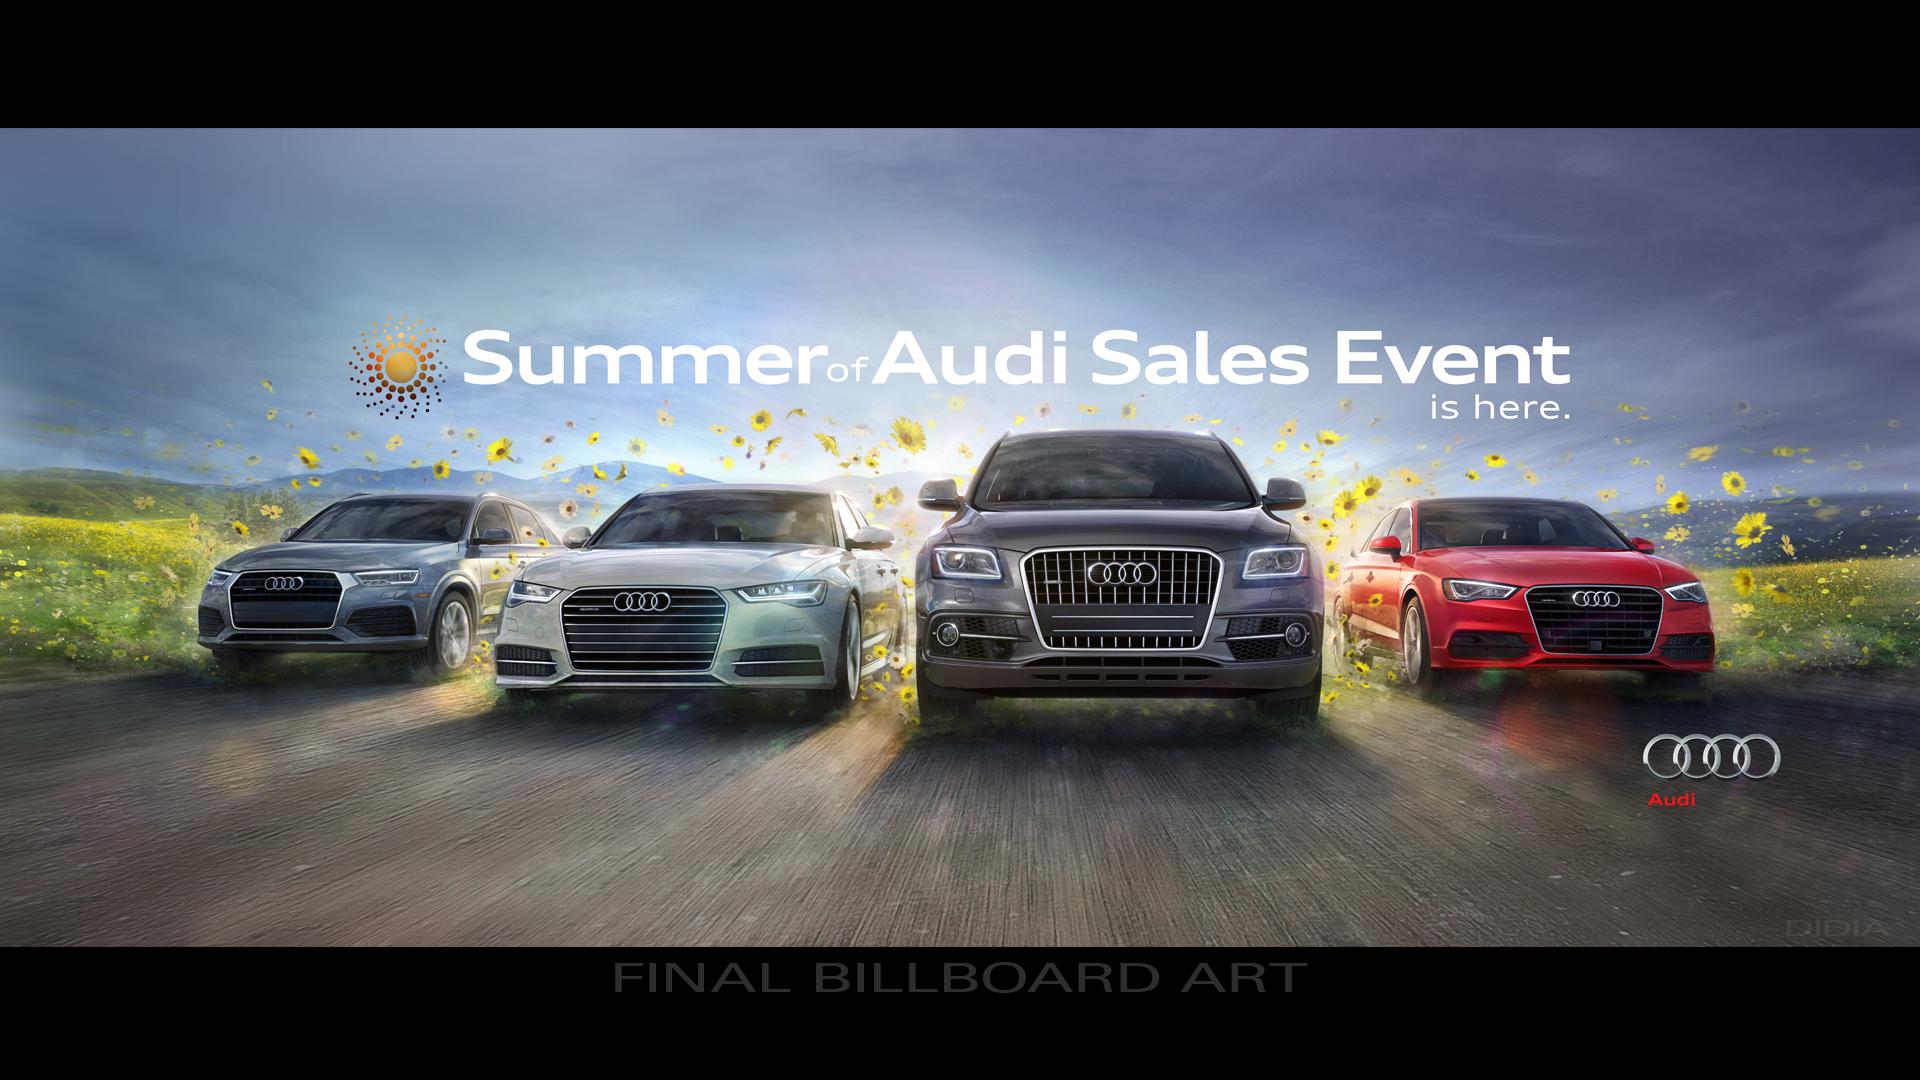 event blog sales audi toronto best in torontos suv feature image featured